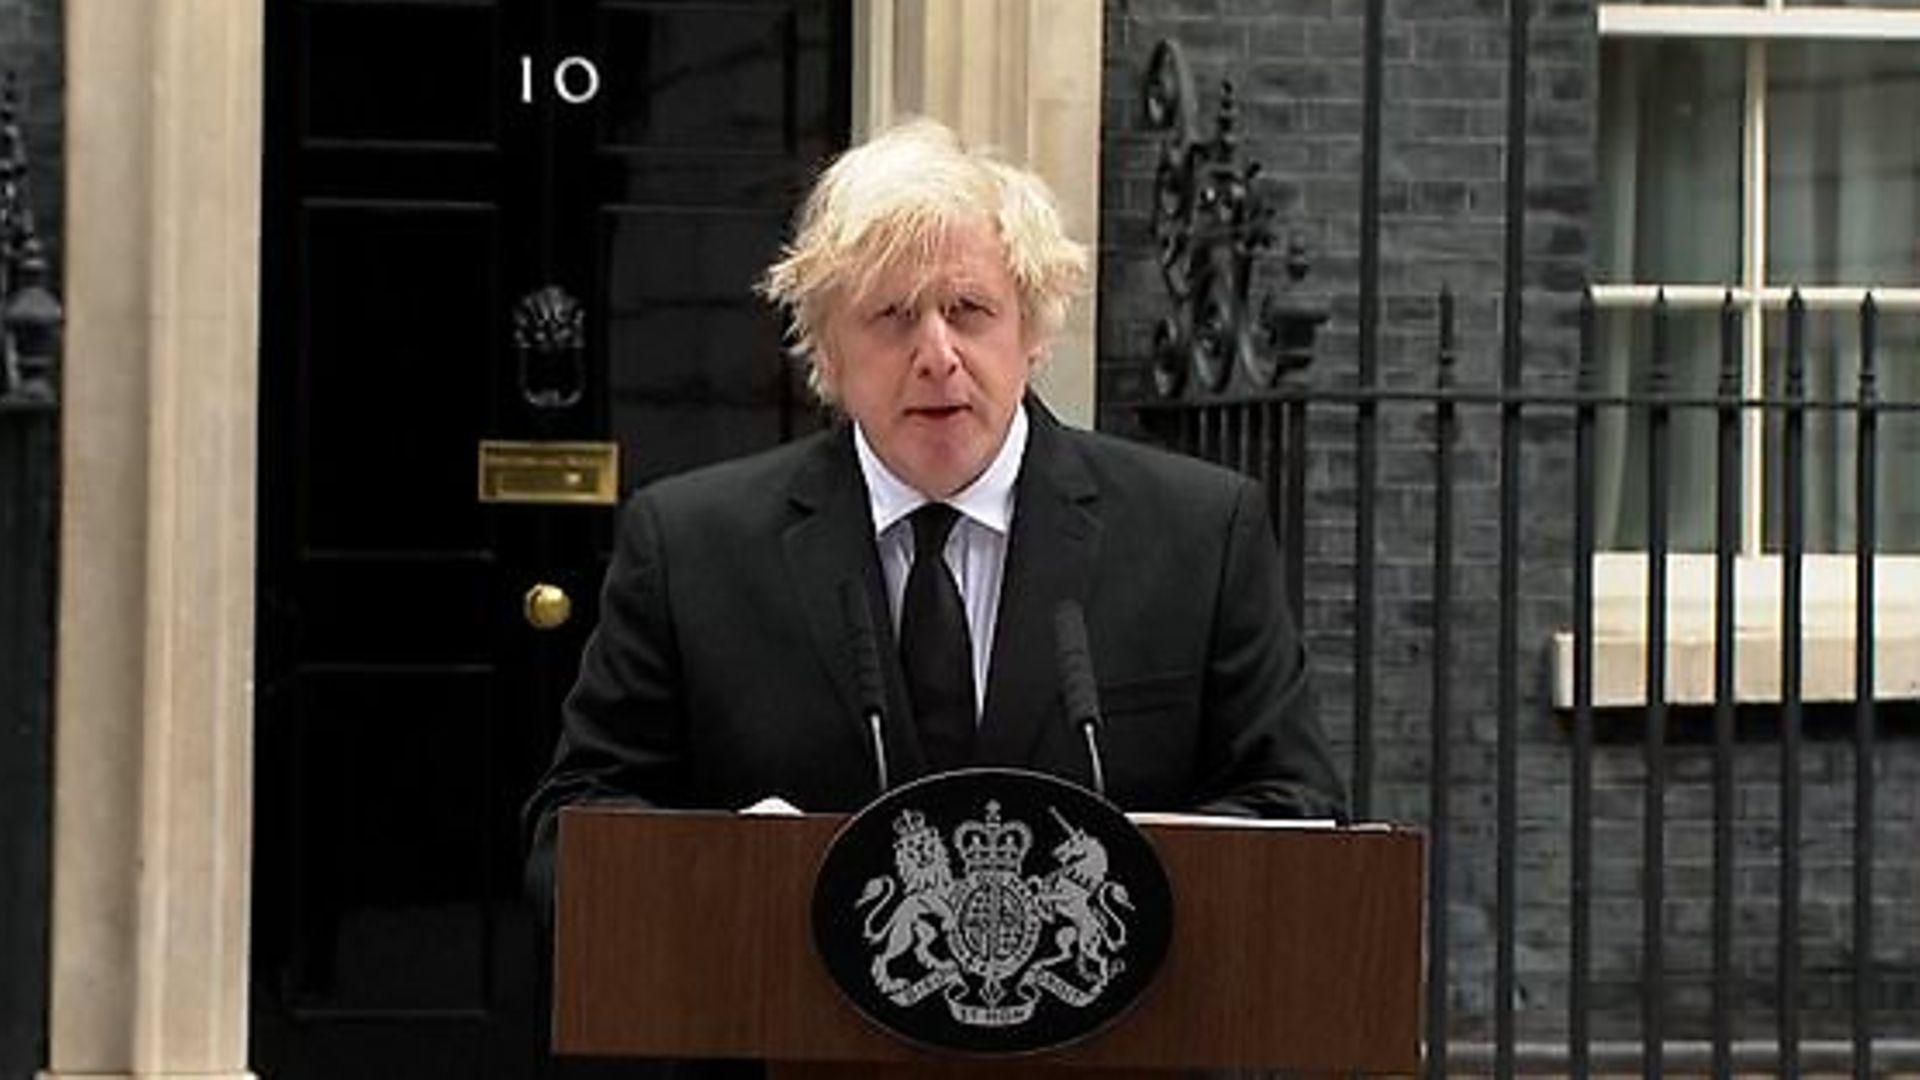 Boris Johnson pays tribute to the Duke of Edinbugh on the doorstep of Number 10 - Credit: PA